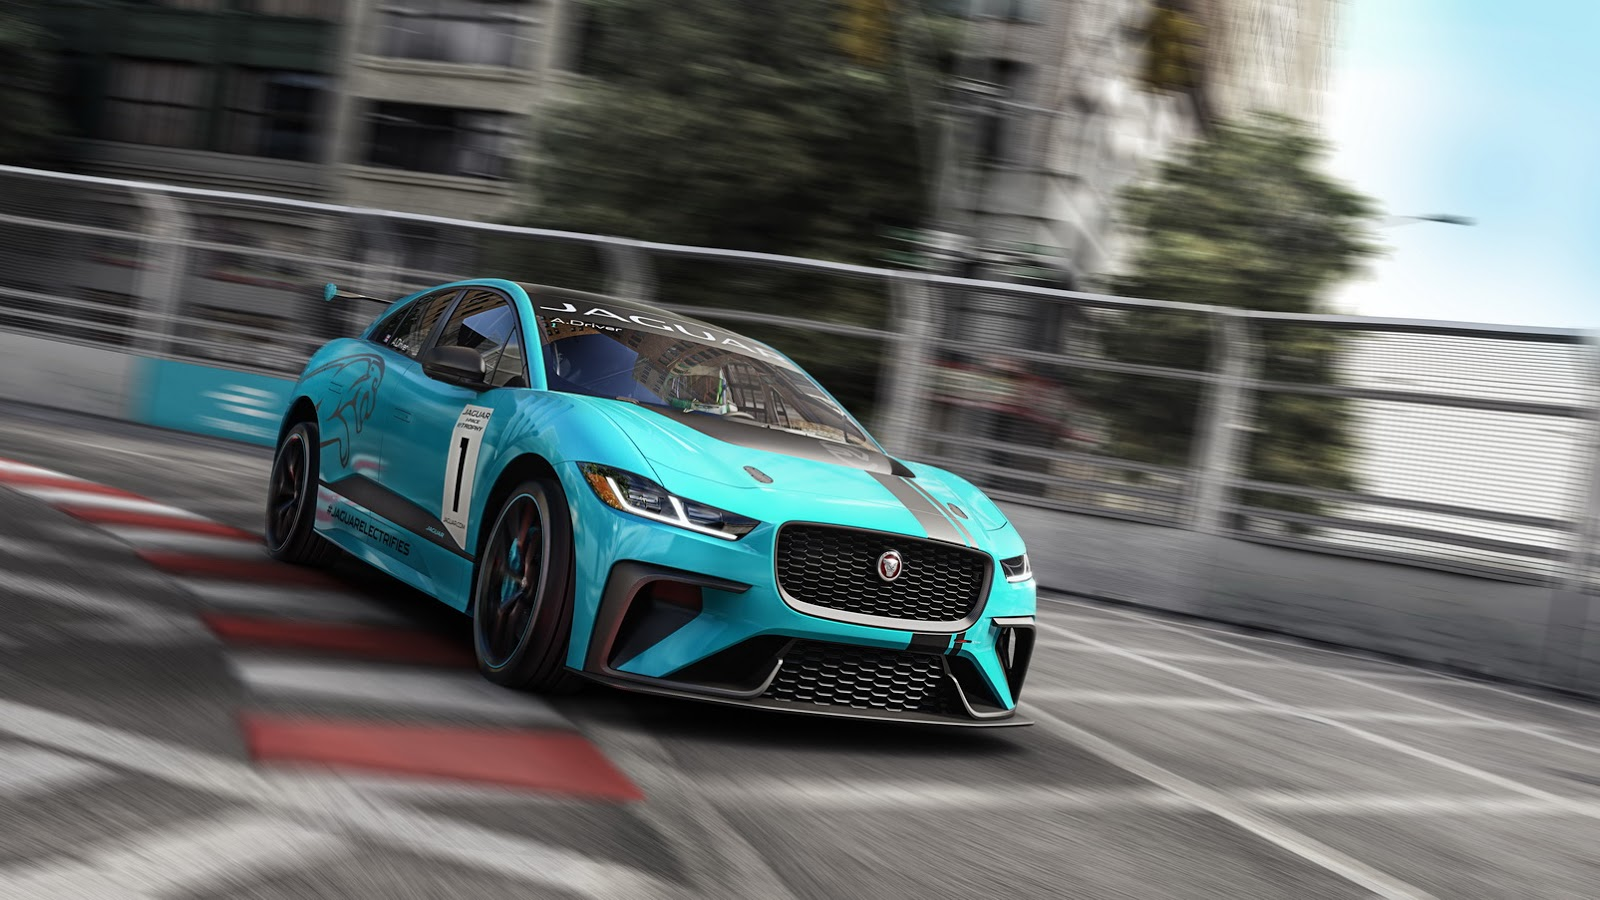 jaguar-ipace-race-car-iaa-26